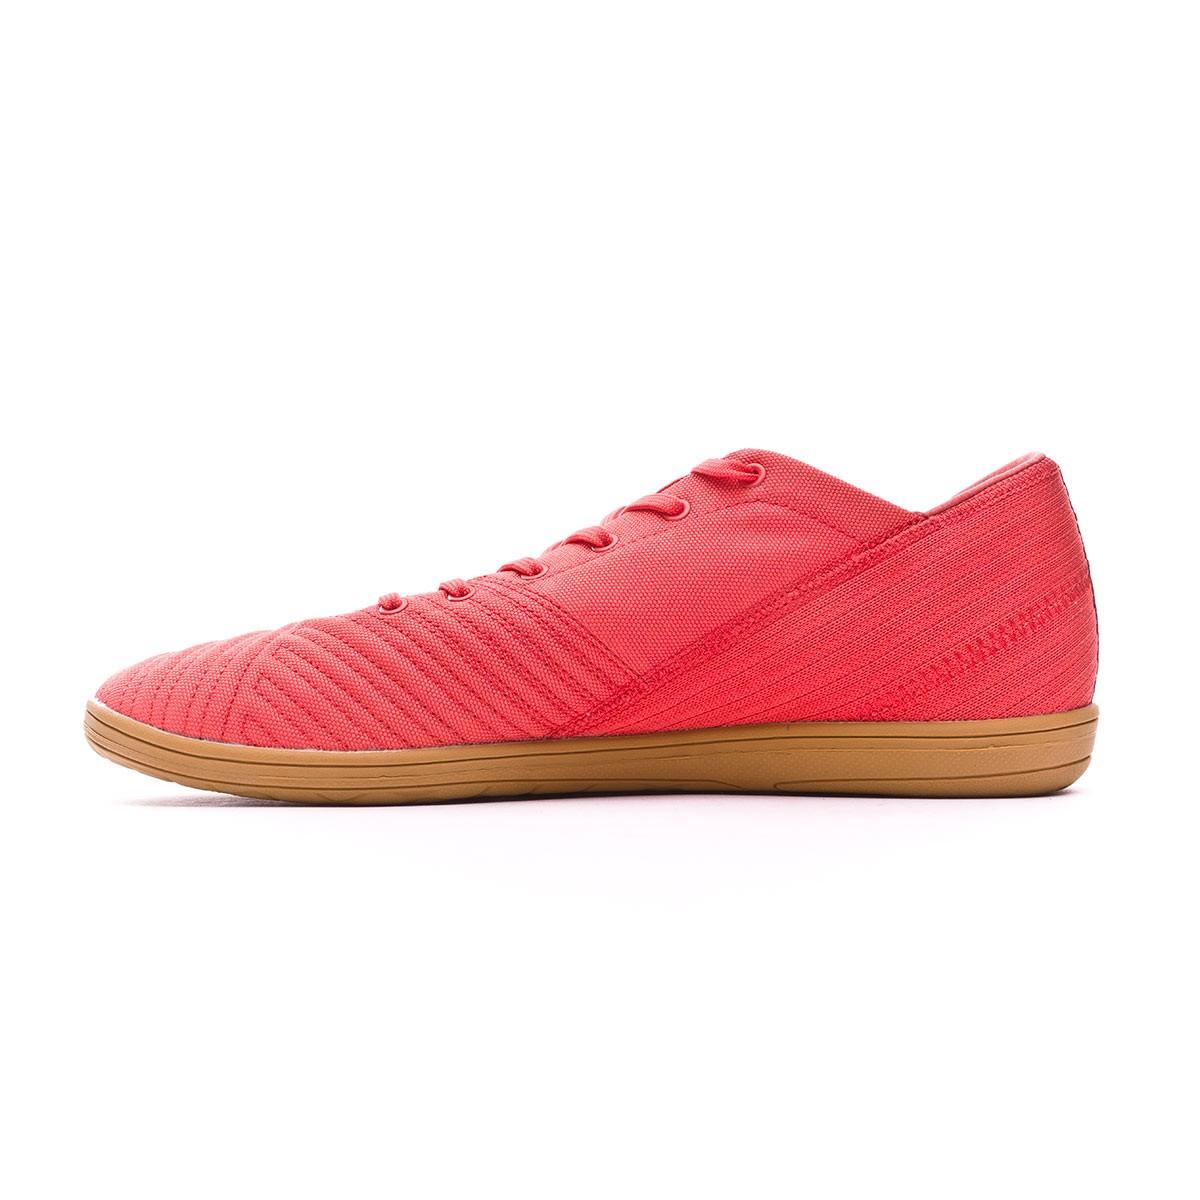 factory authentic d269d a6b54 Futsal Boot adidas Nemeziz Tango 17.4 IN Sala Real coral-Red zest - Tienda de  fútbol Fútbol Emotion